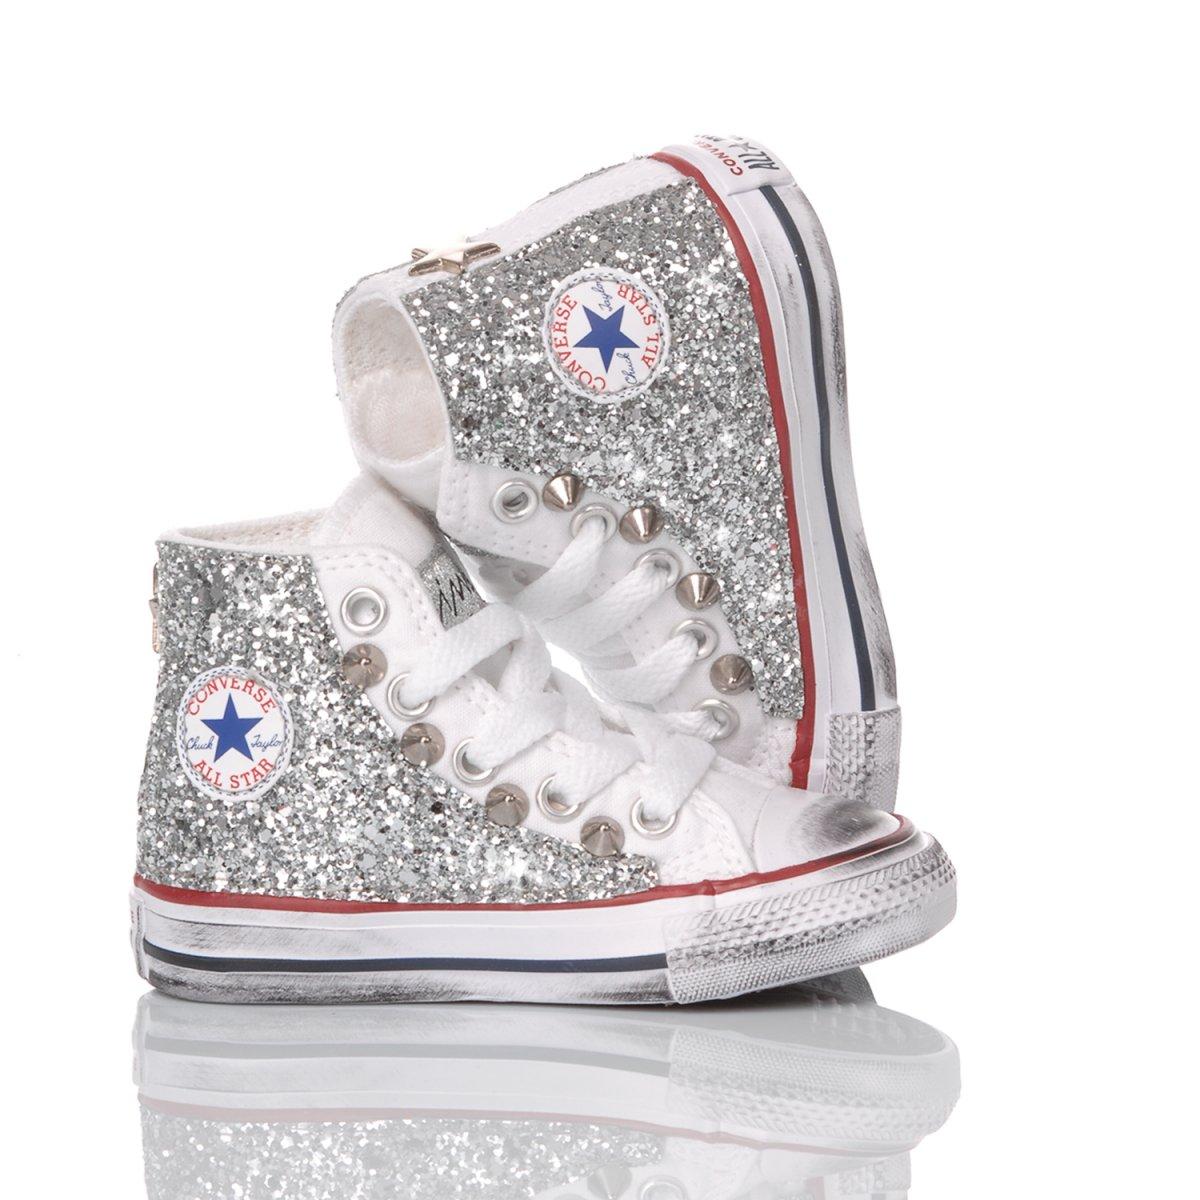 Converse Baby Glitter Silver